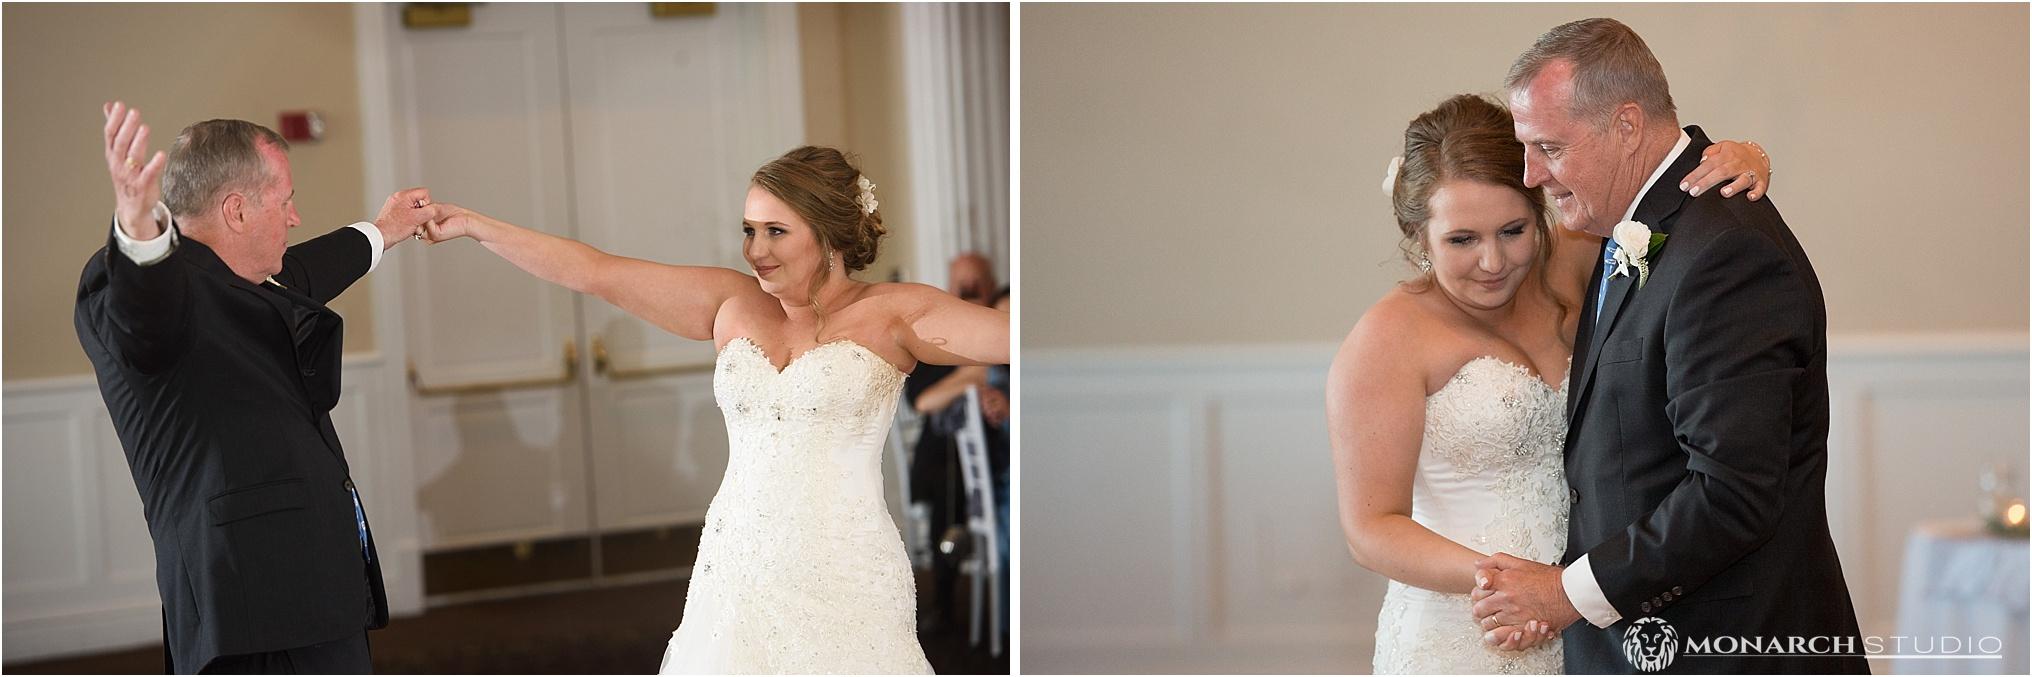 williamsburg-virginia-wedding-photographer-104.jpg